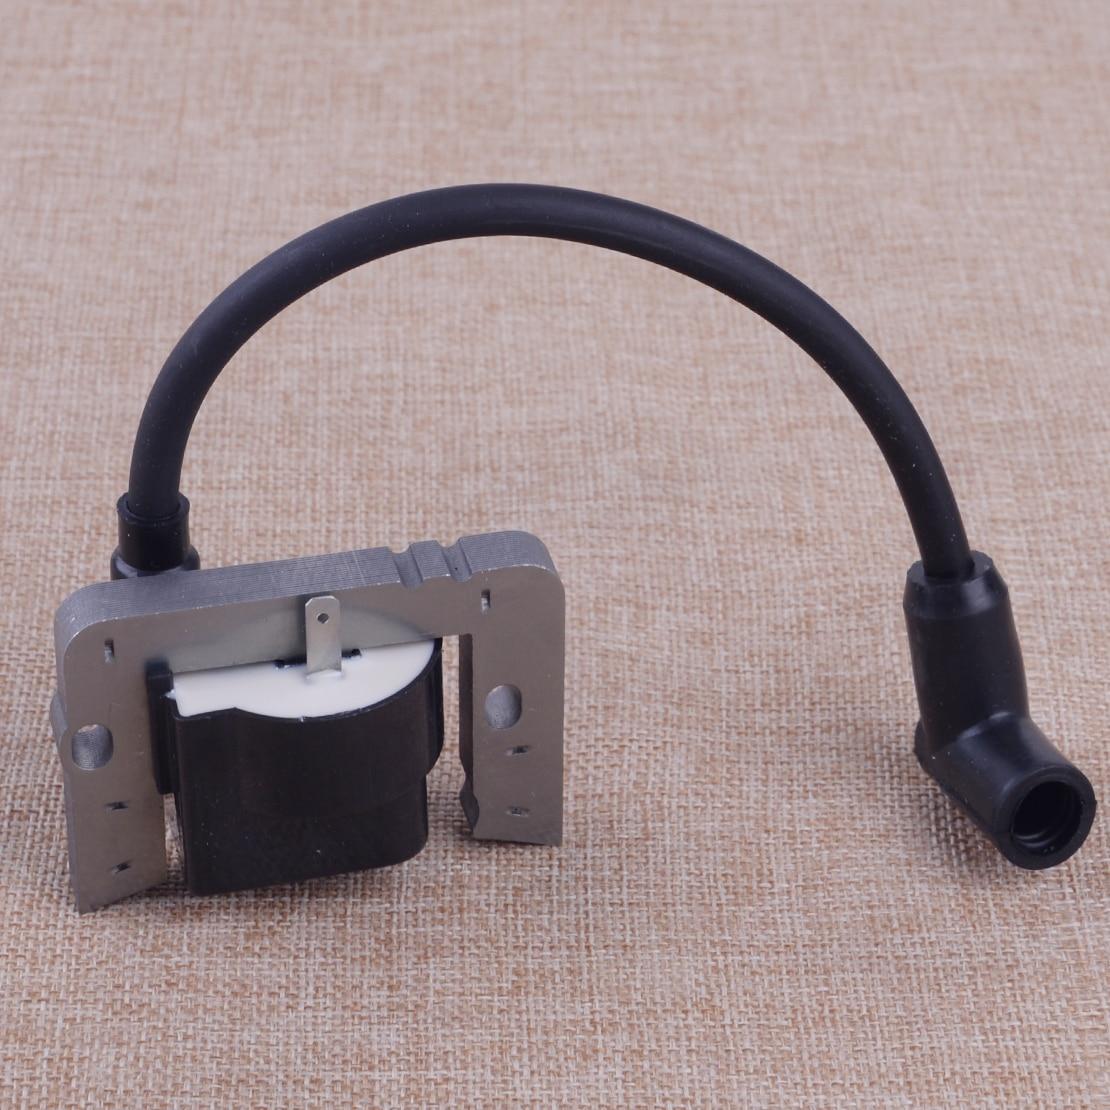 LETAOSK Plastic Alloy Ignition Coil Module 35135 35135A 35135B Fit For Tecumseh HM70 HM80 HM90 HM100 Solid State HM HMSK